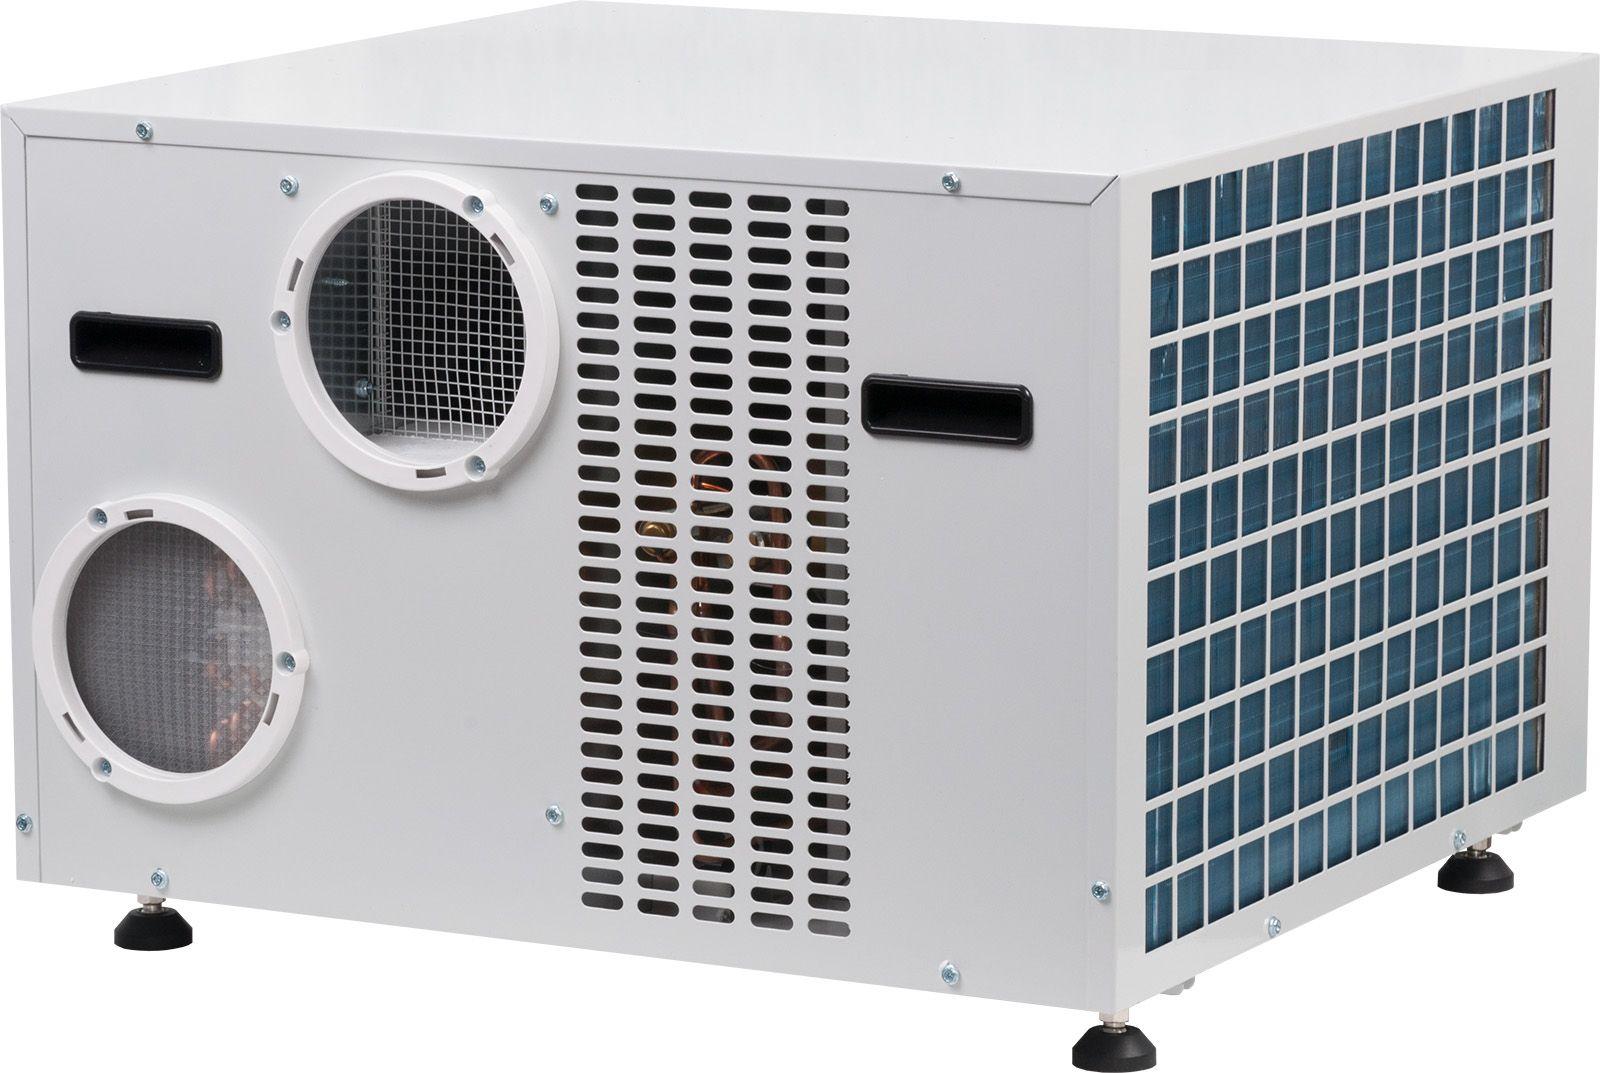 ClimateRight 10000 btu Air Conditioner & Heater